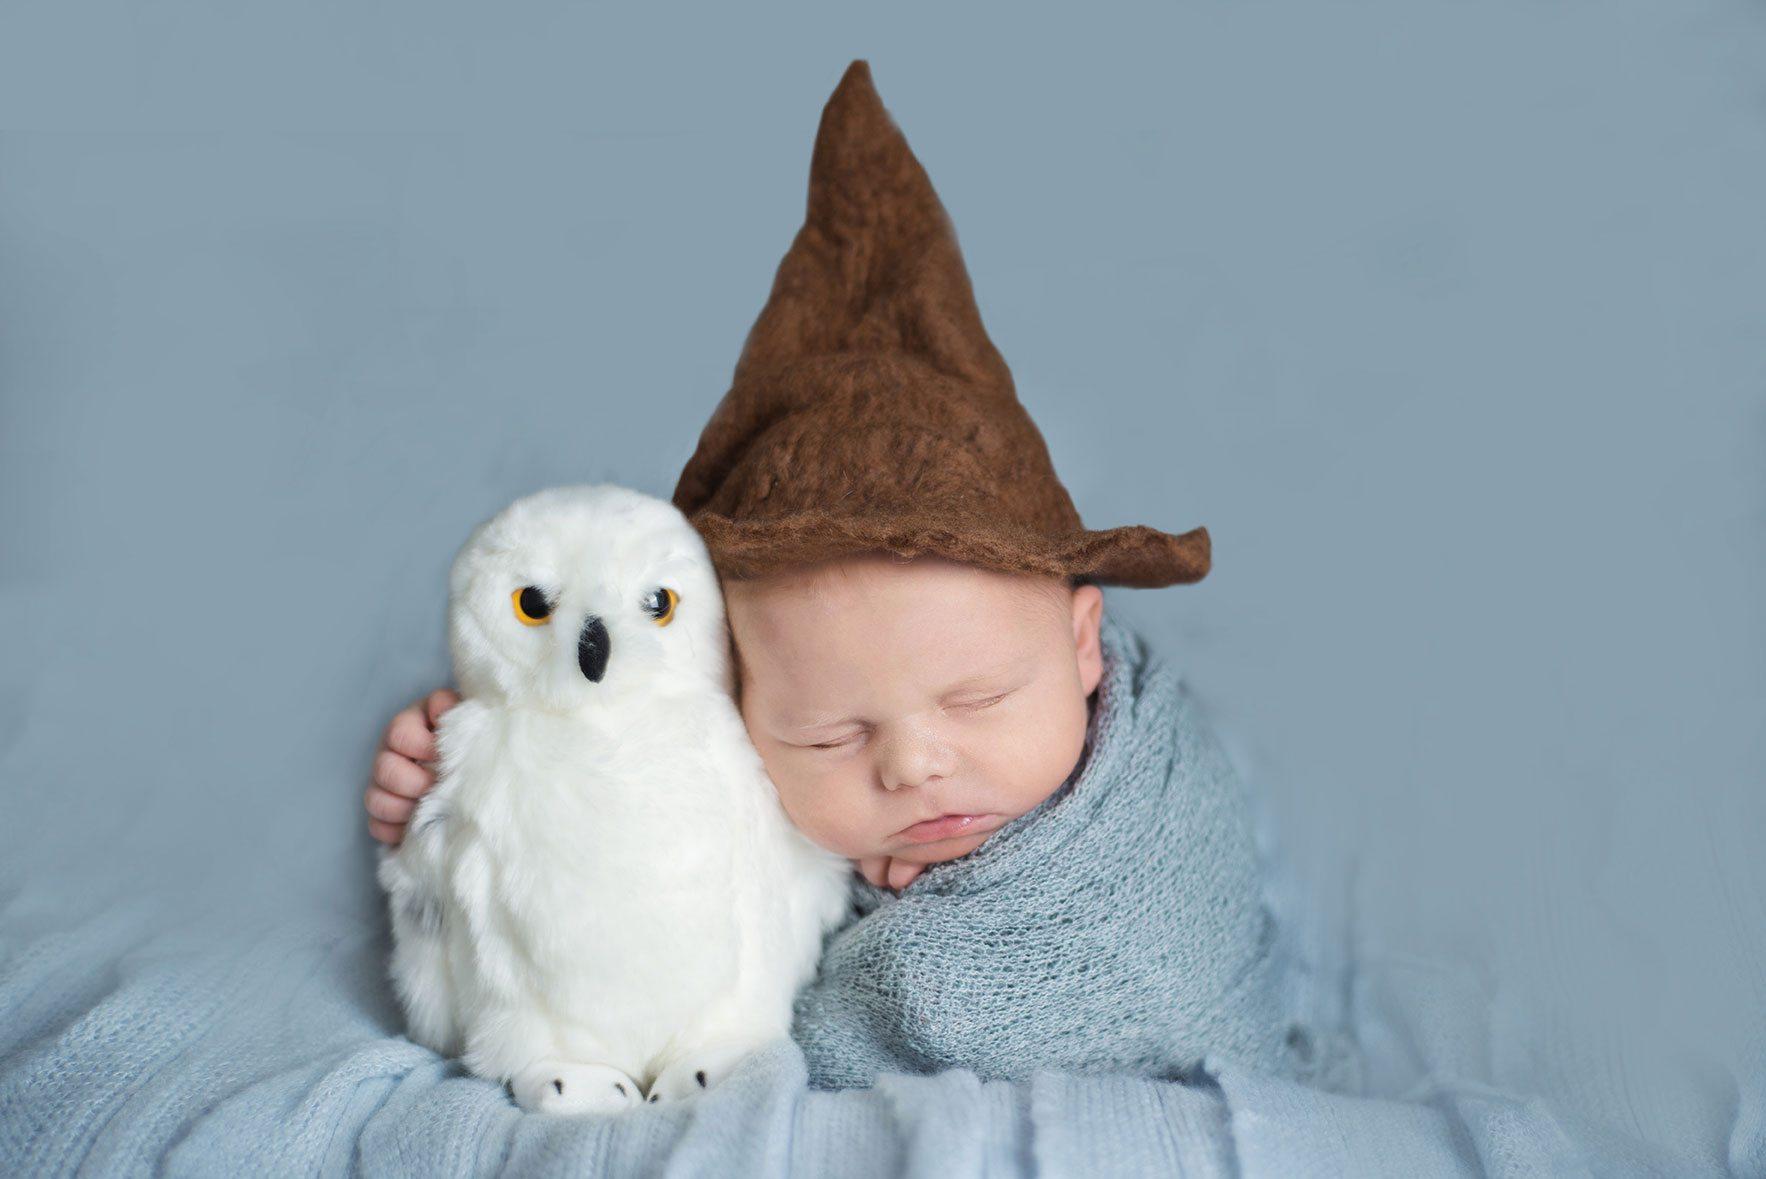 Harry Potter baby potato sack pose cuddling Hedwig